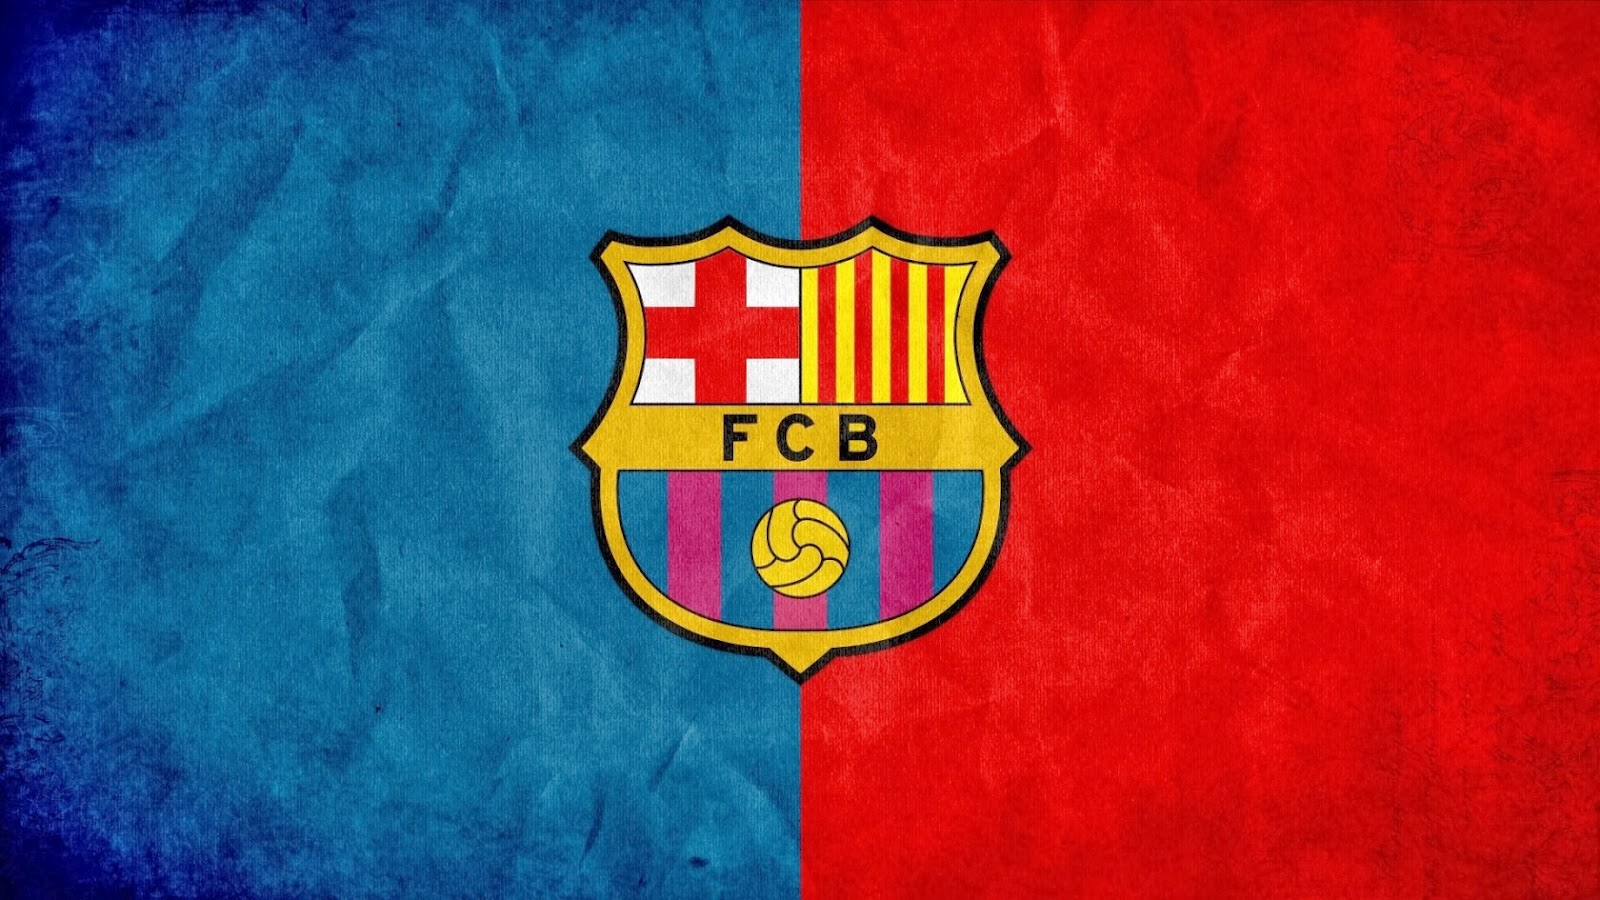 barcelona football club latest hd wallpapers latest hd wallpapers